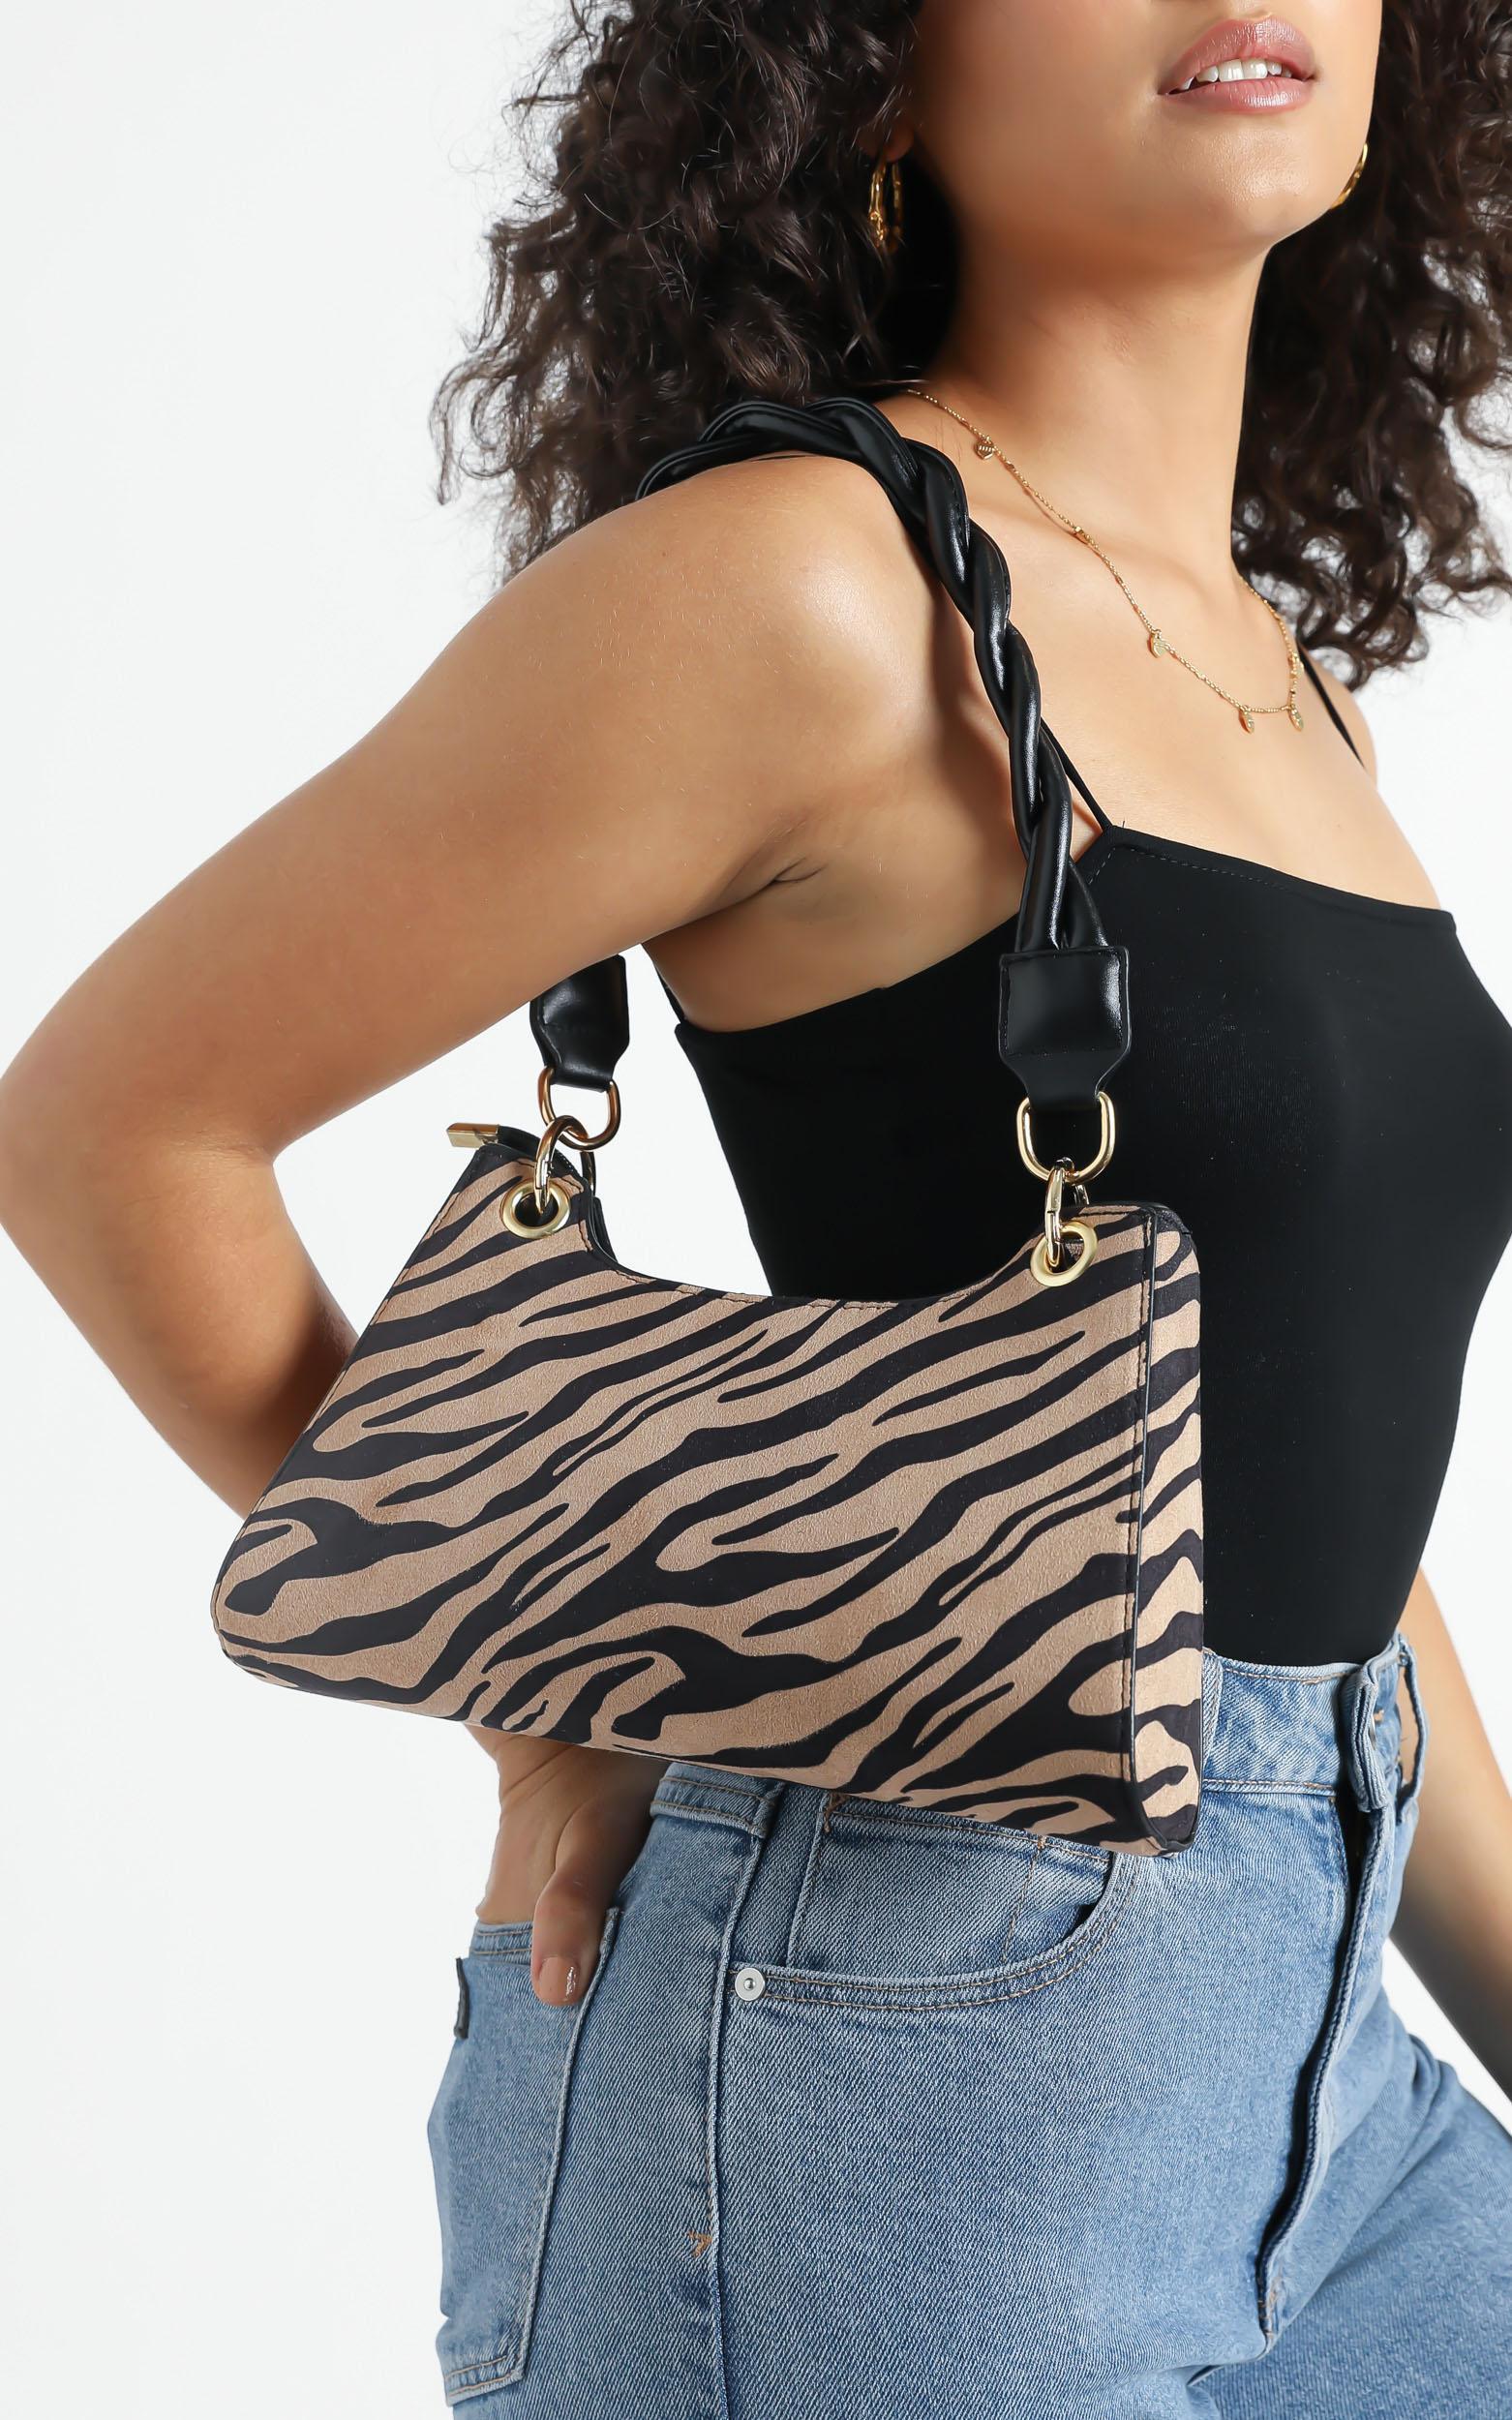 Luz Bag in Zebra Print, , hi-res image number null